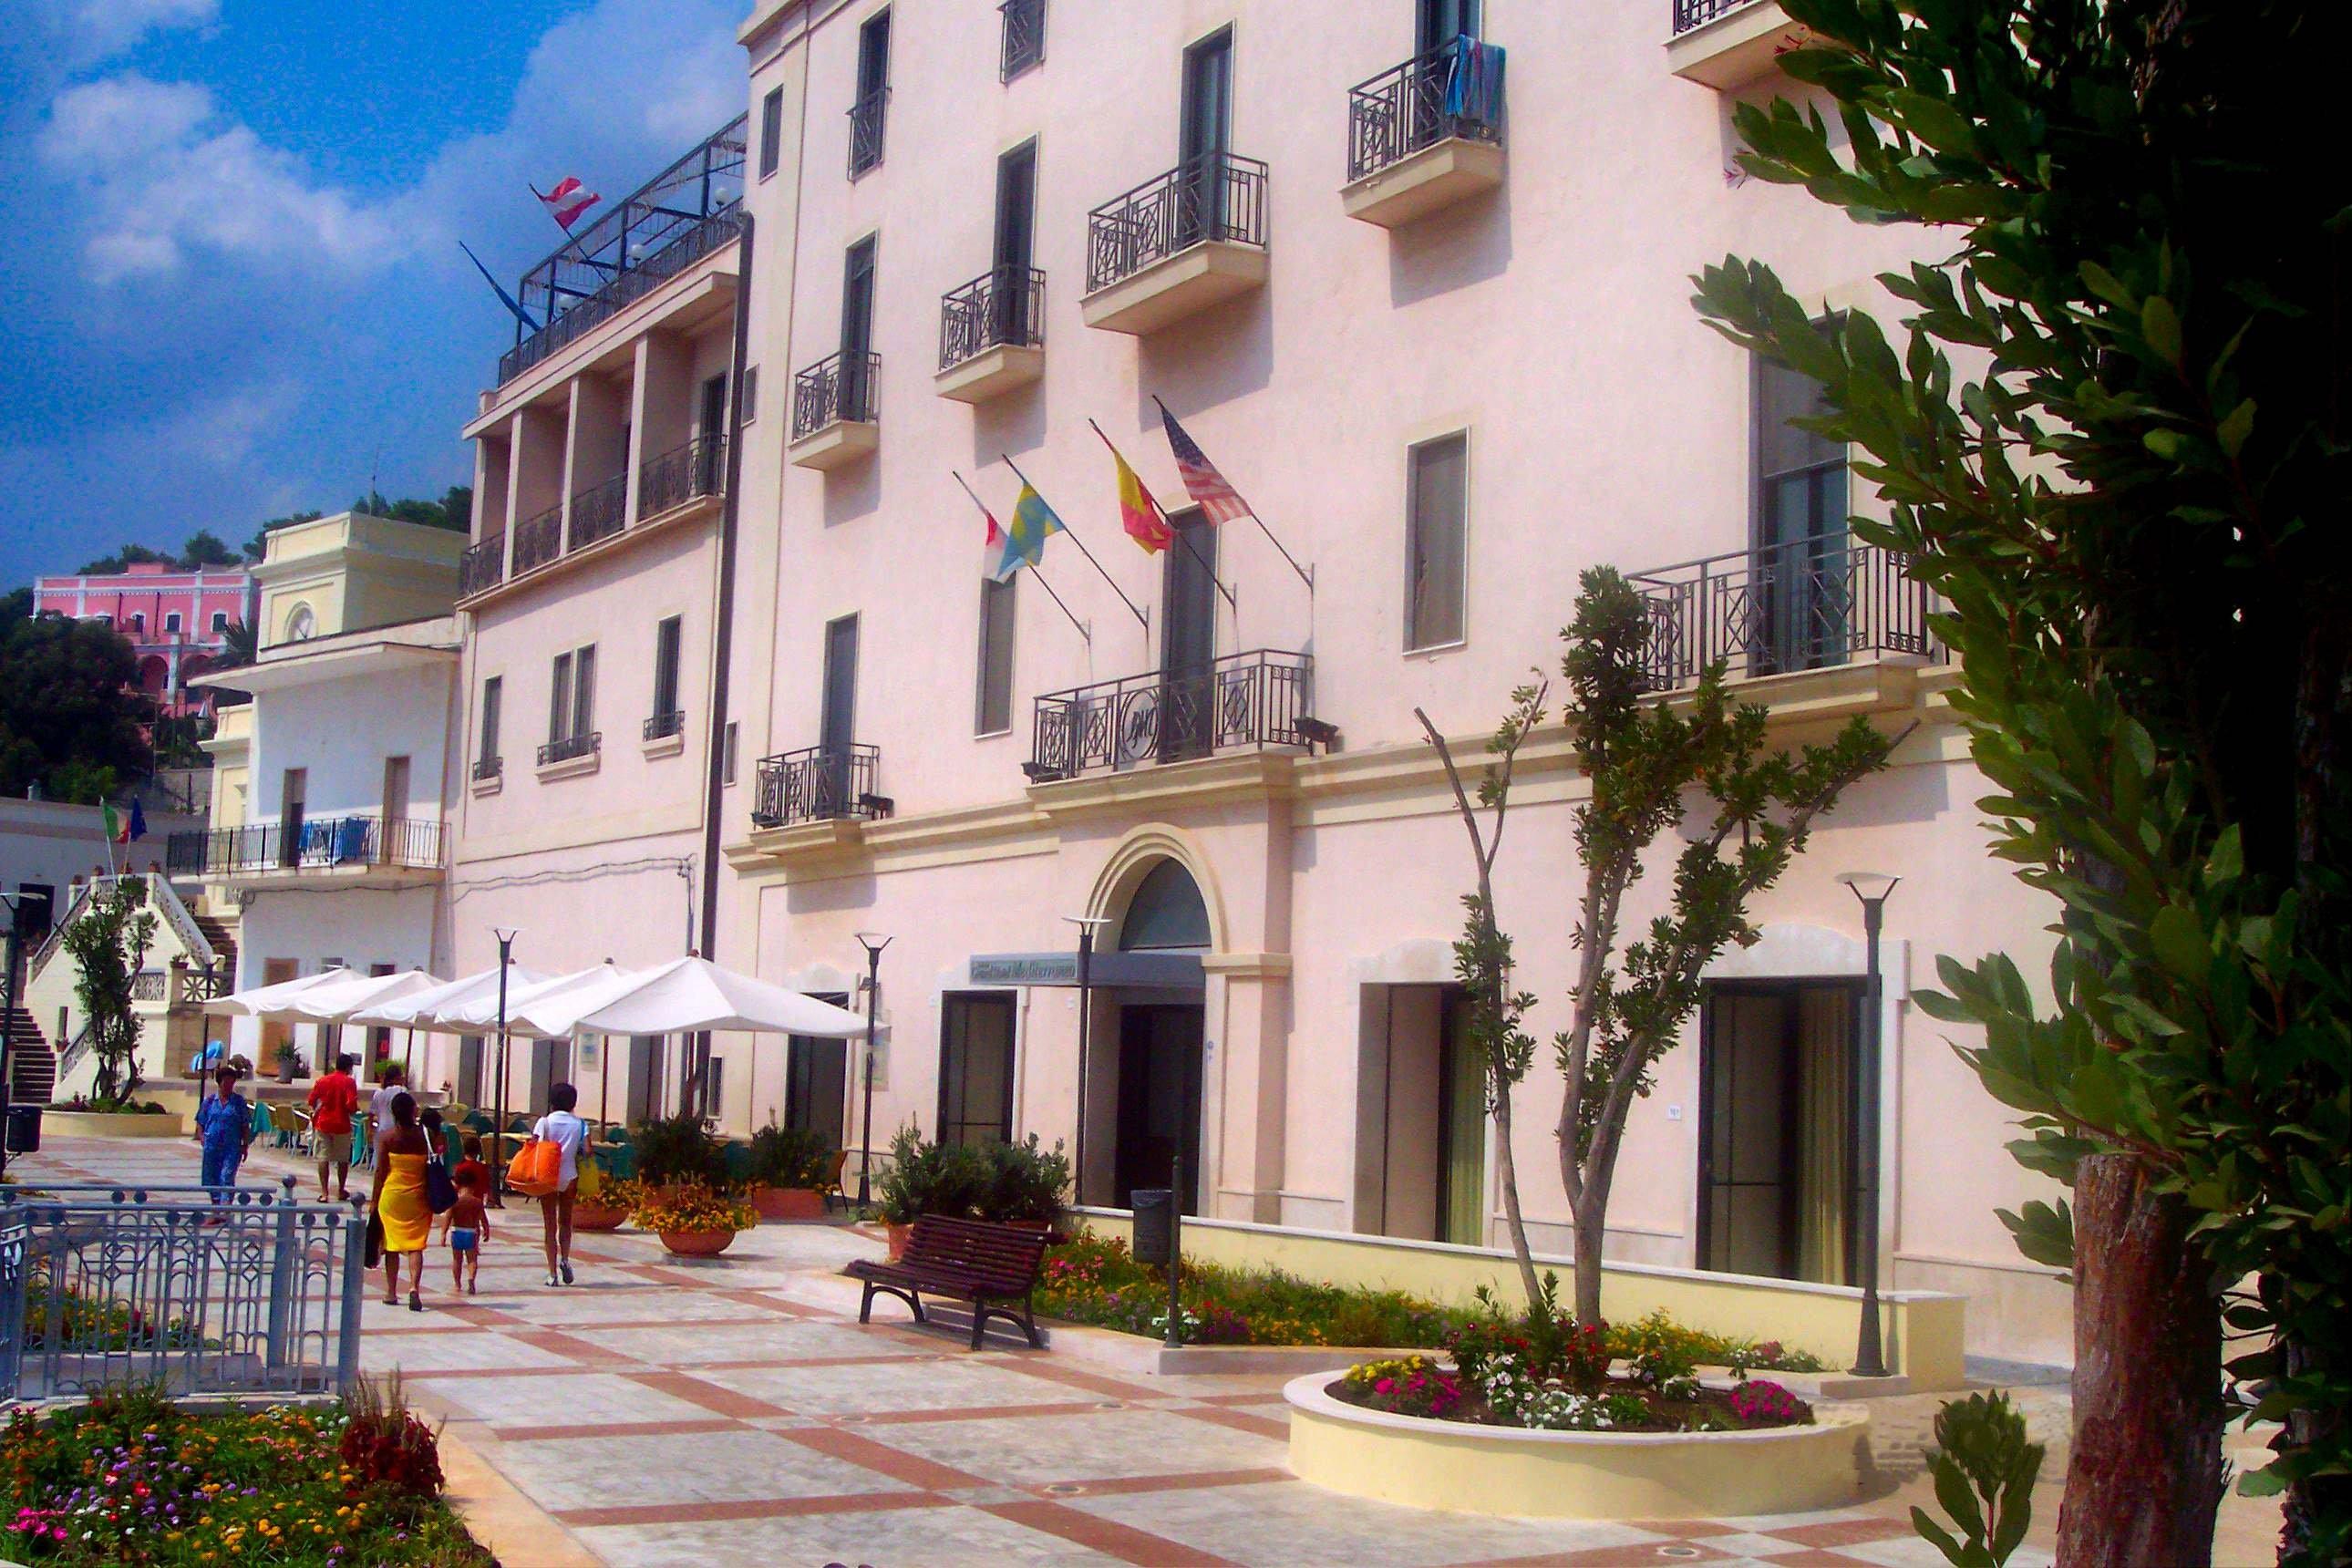 Hotel mediterraneo santa cesarea terme su - Piscina mediterraneo taranto ...